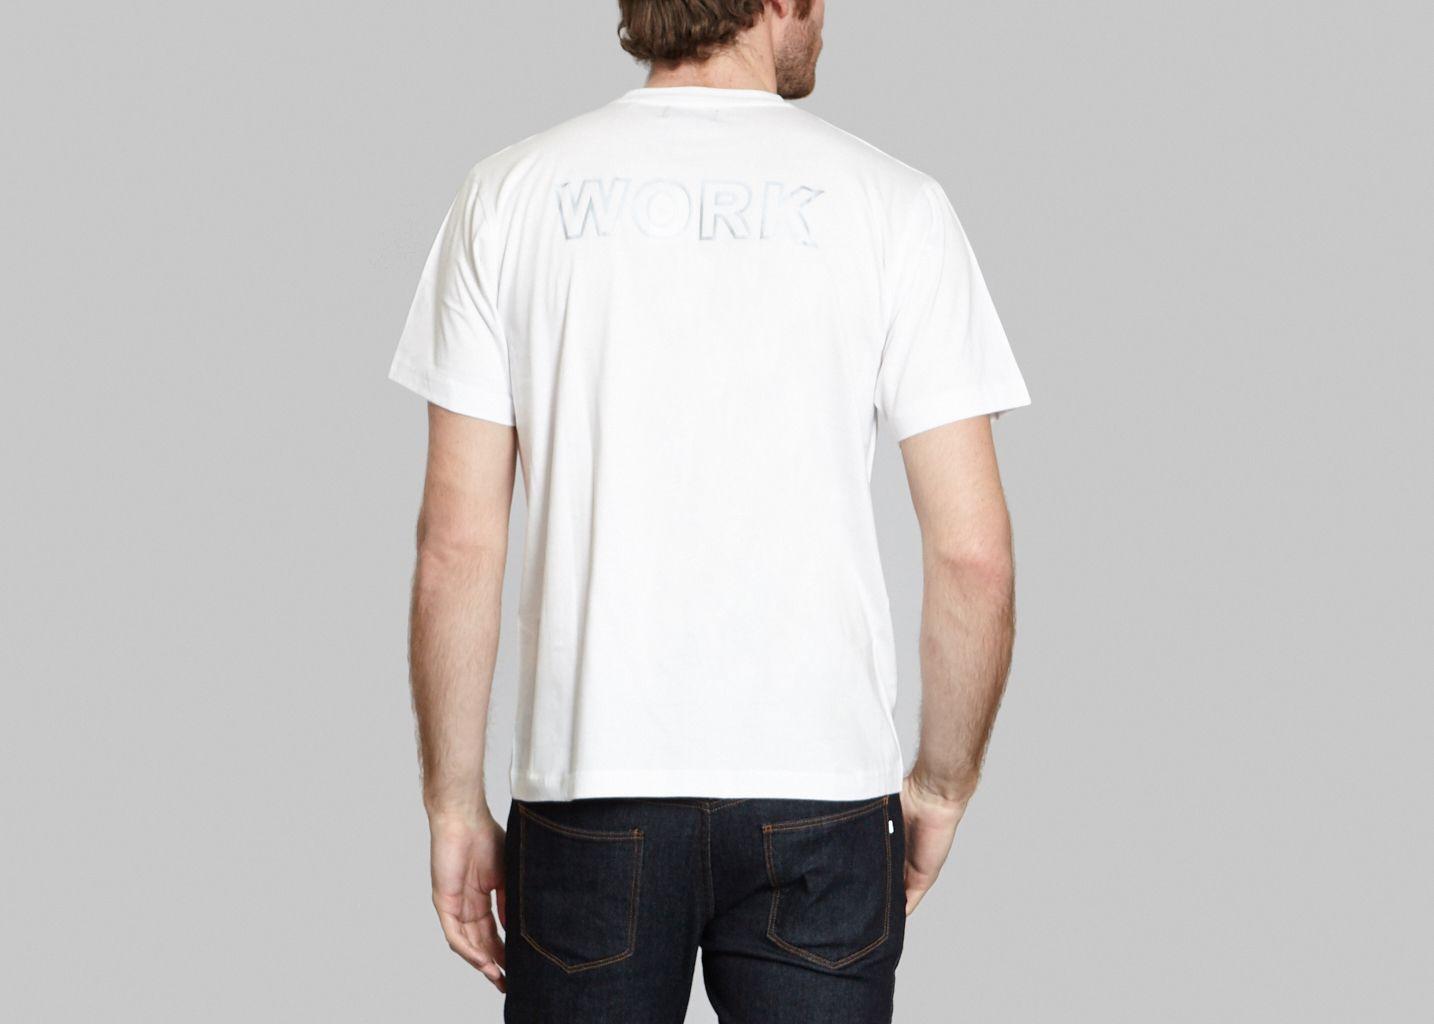 Work T-shirt - Andrea Crews